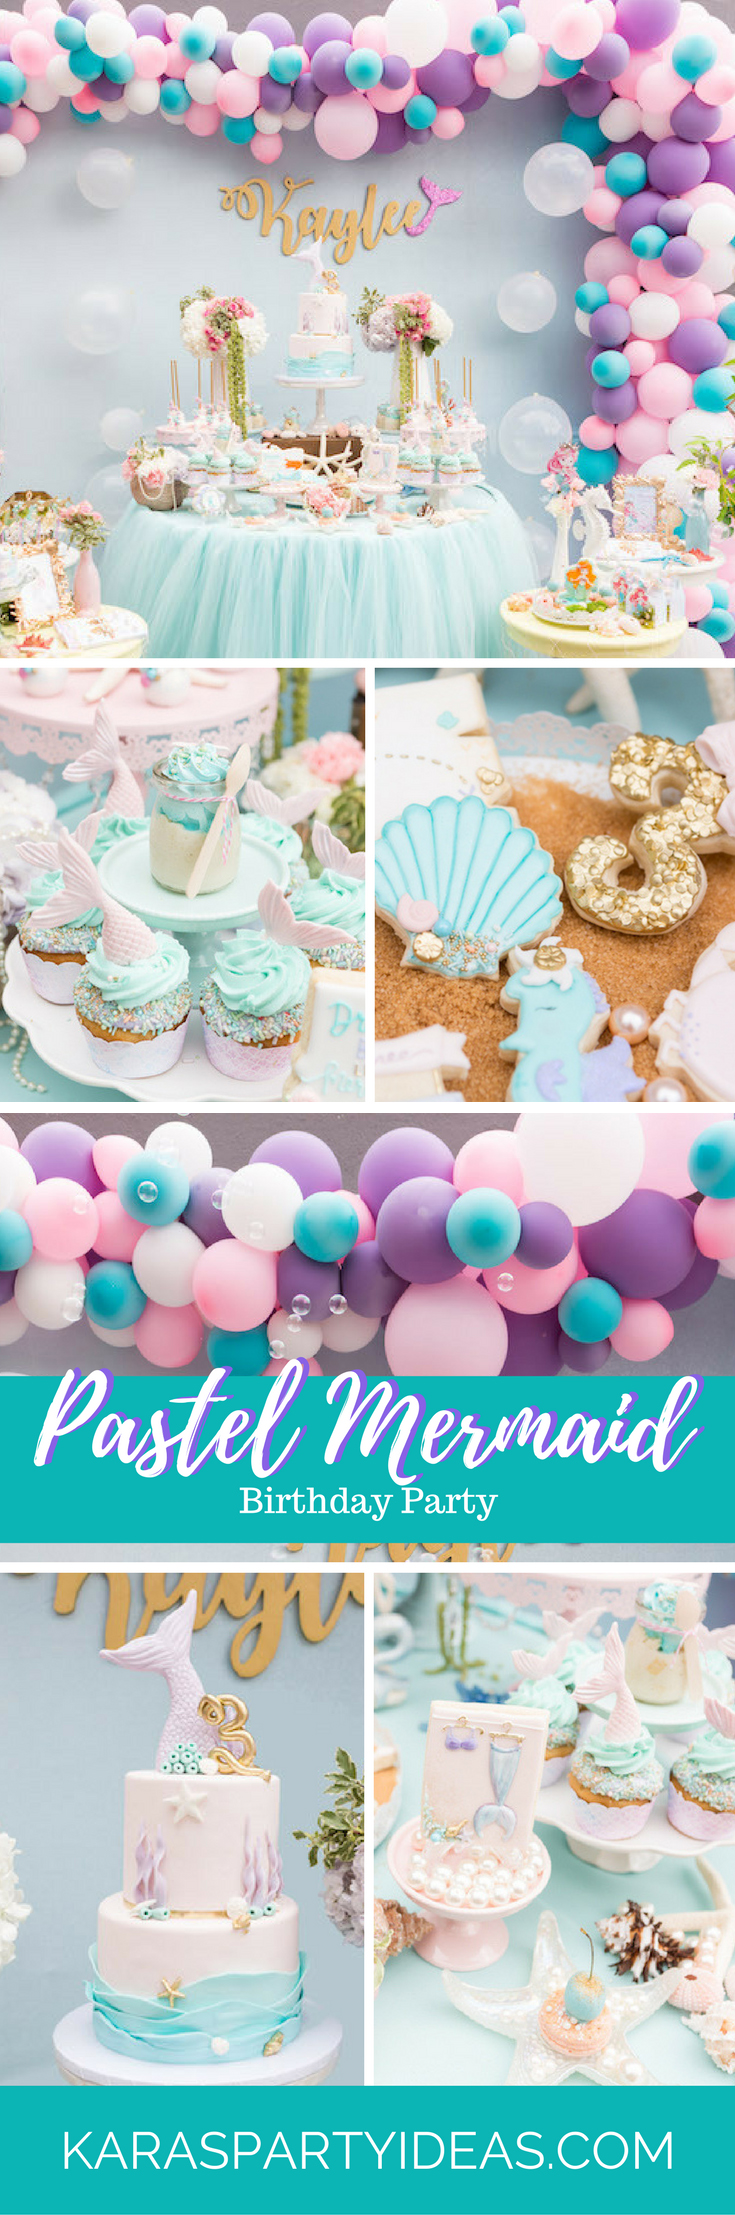 Tea time tea birthday party via kara s party ideas karaspartyideas com - Pastel Mermaid Birthday Party Via Kara S Party Ideas Karaspartyideas Com